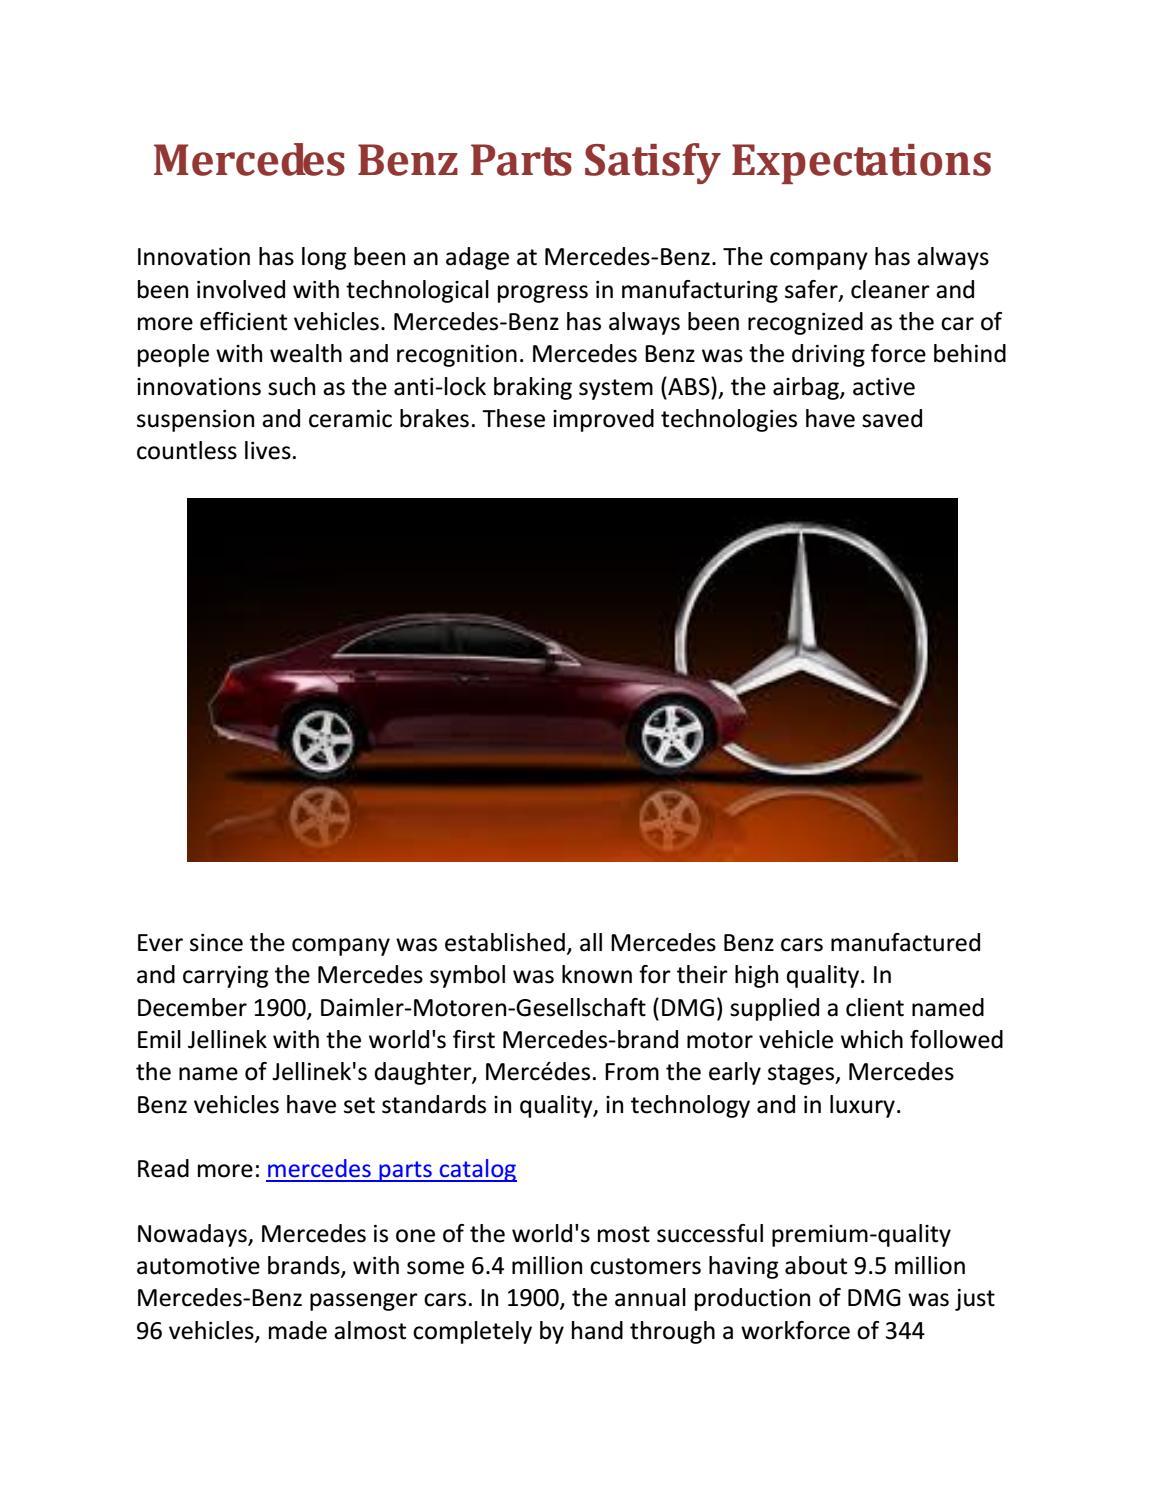 Mercedes Benz Parts Catalog >> Mercedes Benz Parts Satisfy Expectations By Mercedes Parts